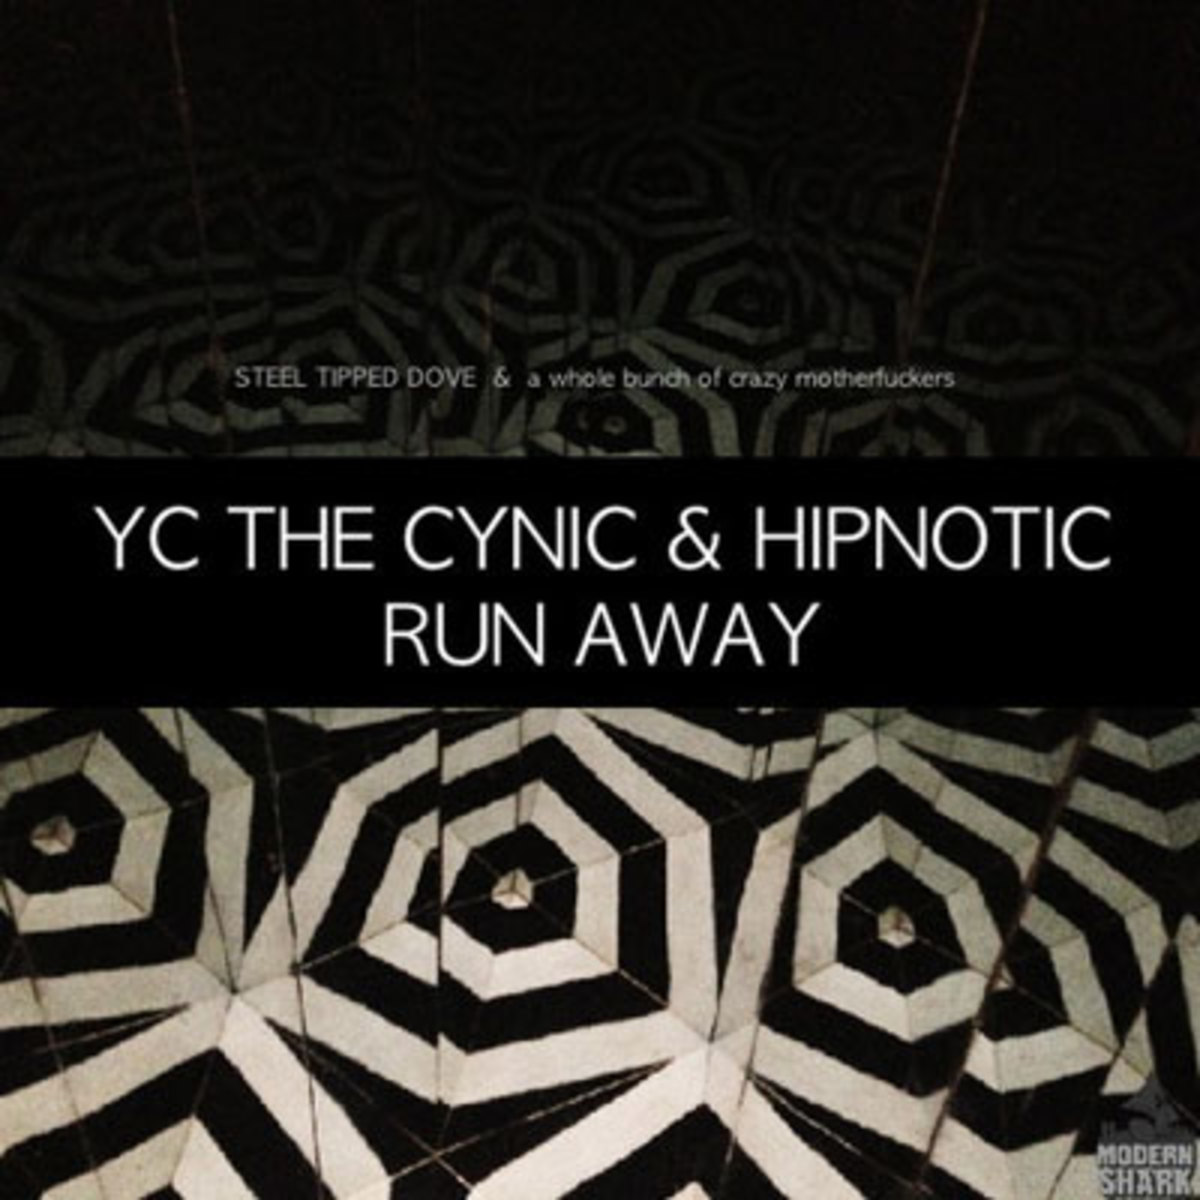 ycthecynic-runaway.jpg